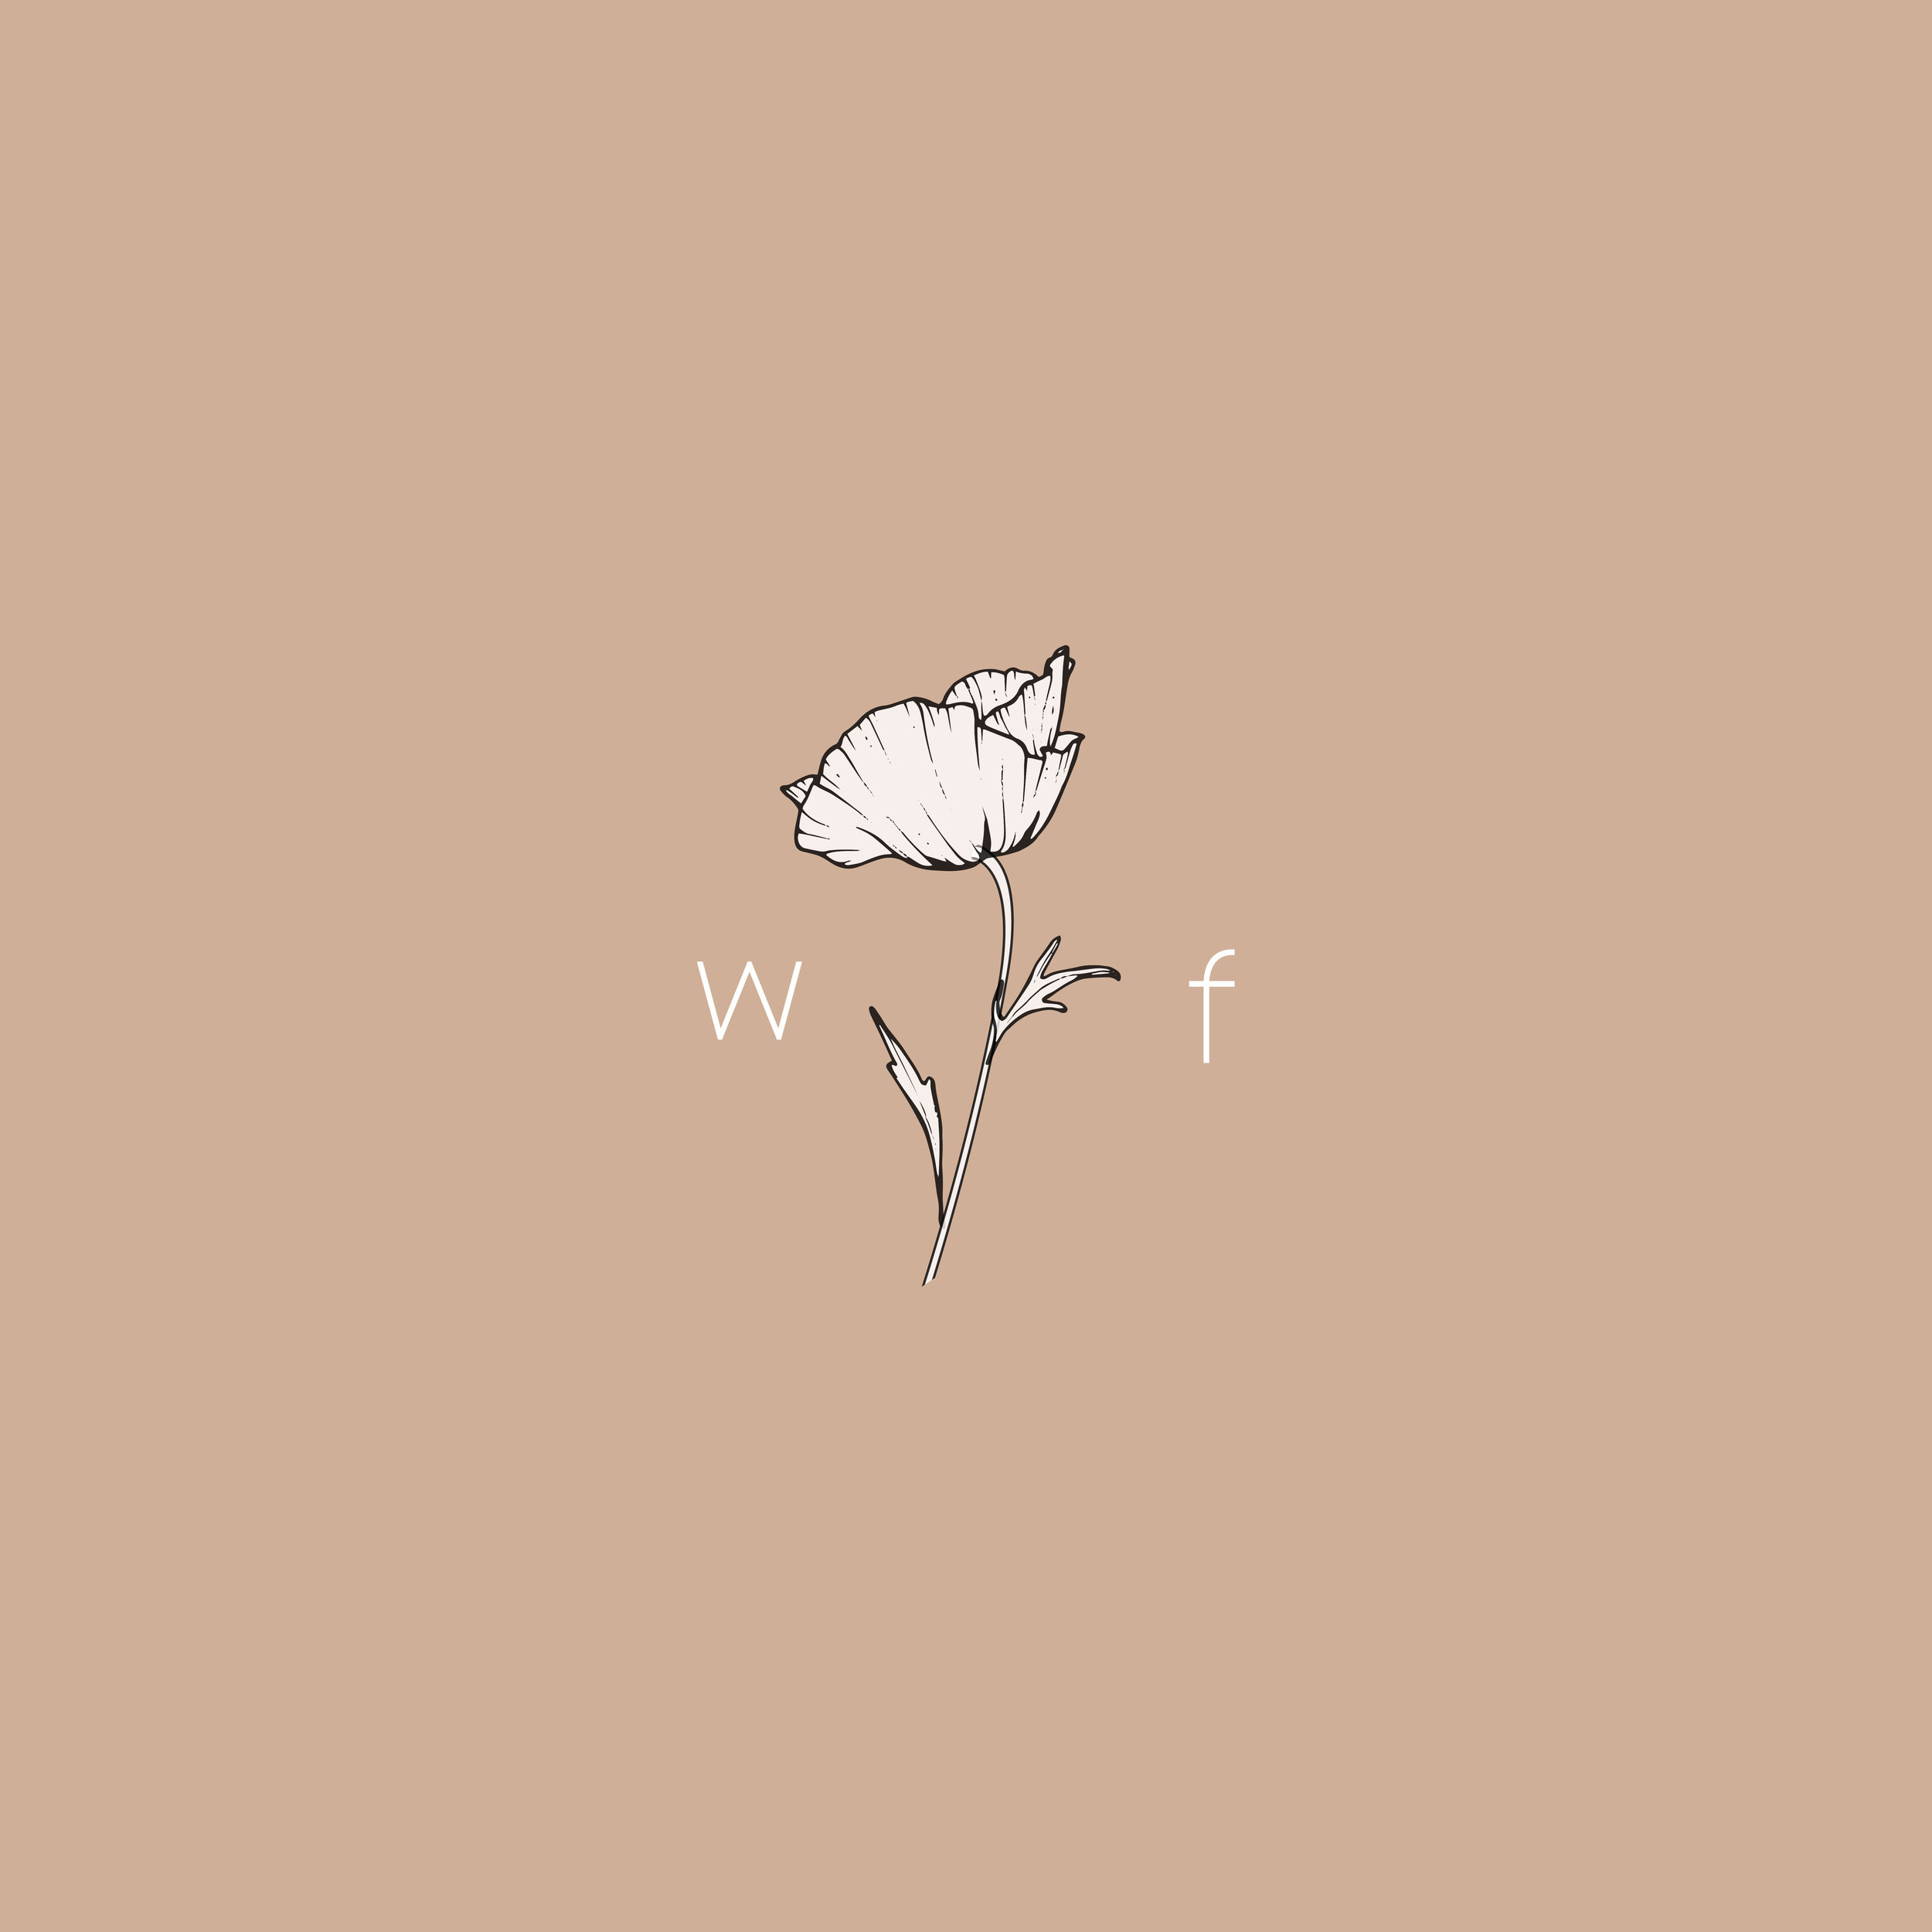 Wall+Flower-Brand-7.jpg